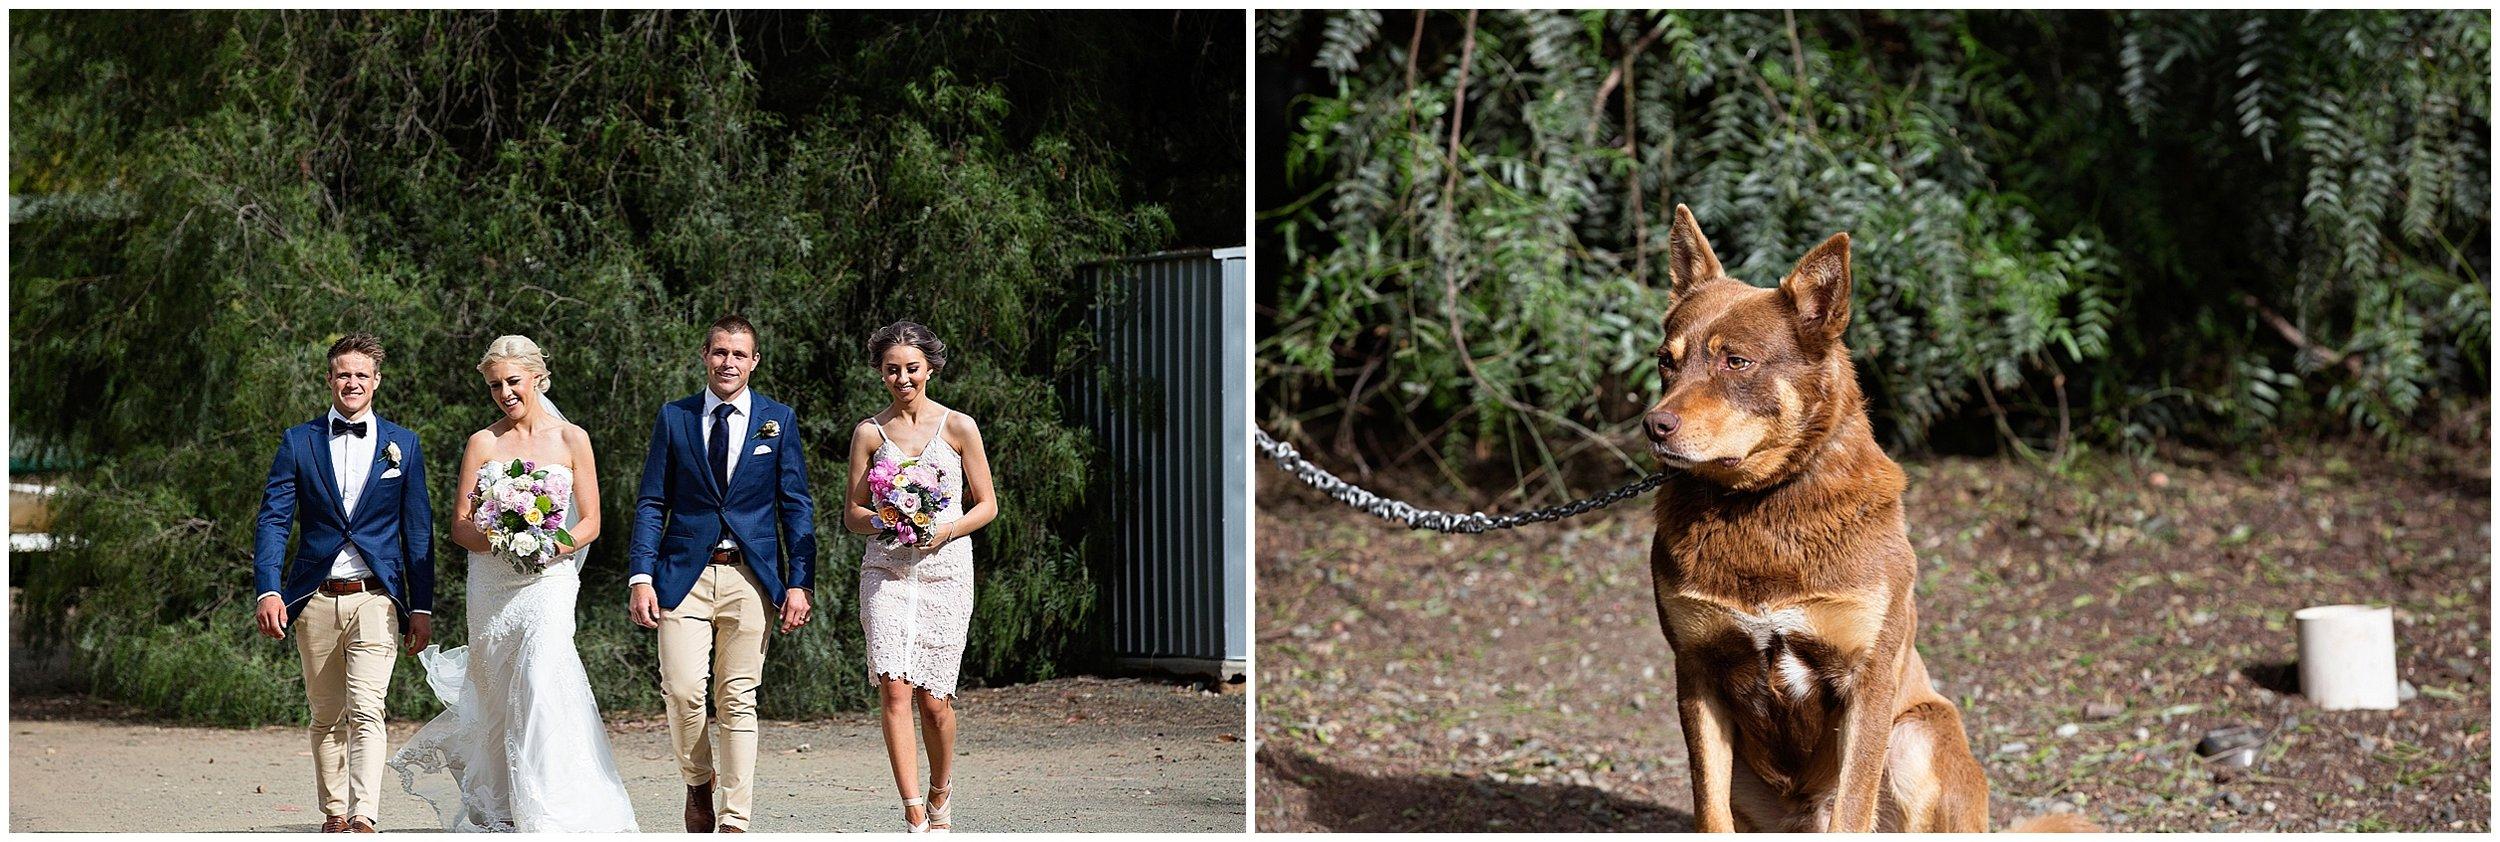 shepparton-wedding-photographer_0182.jpg